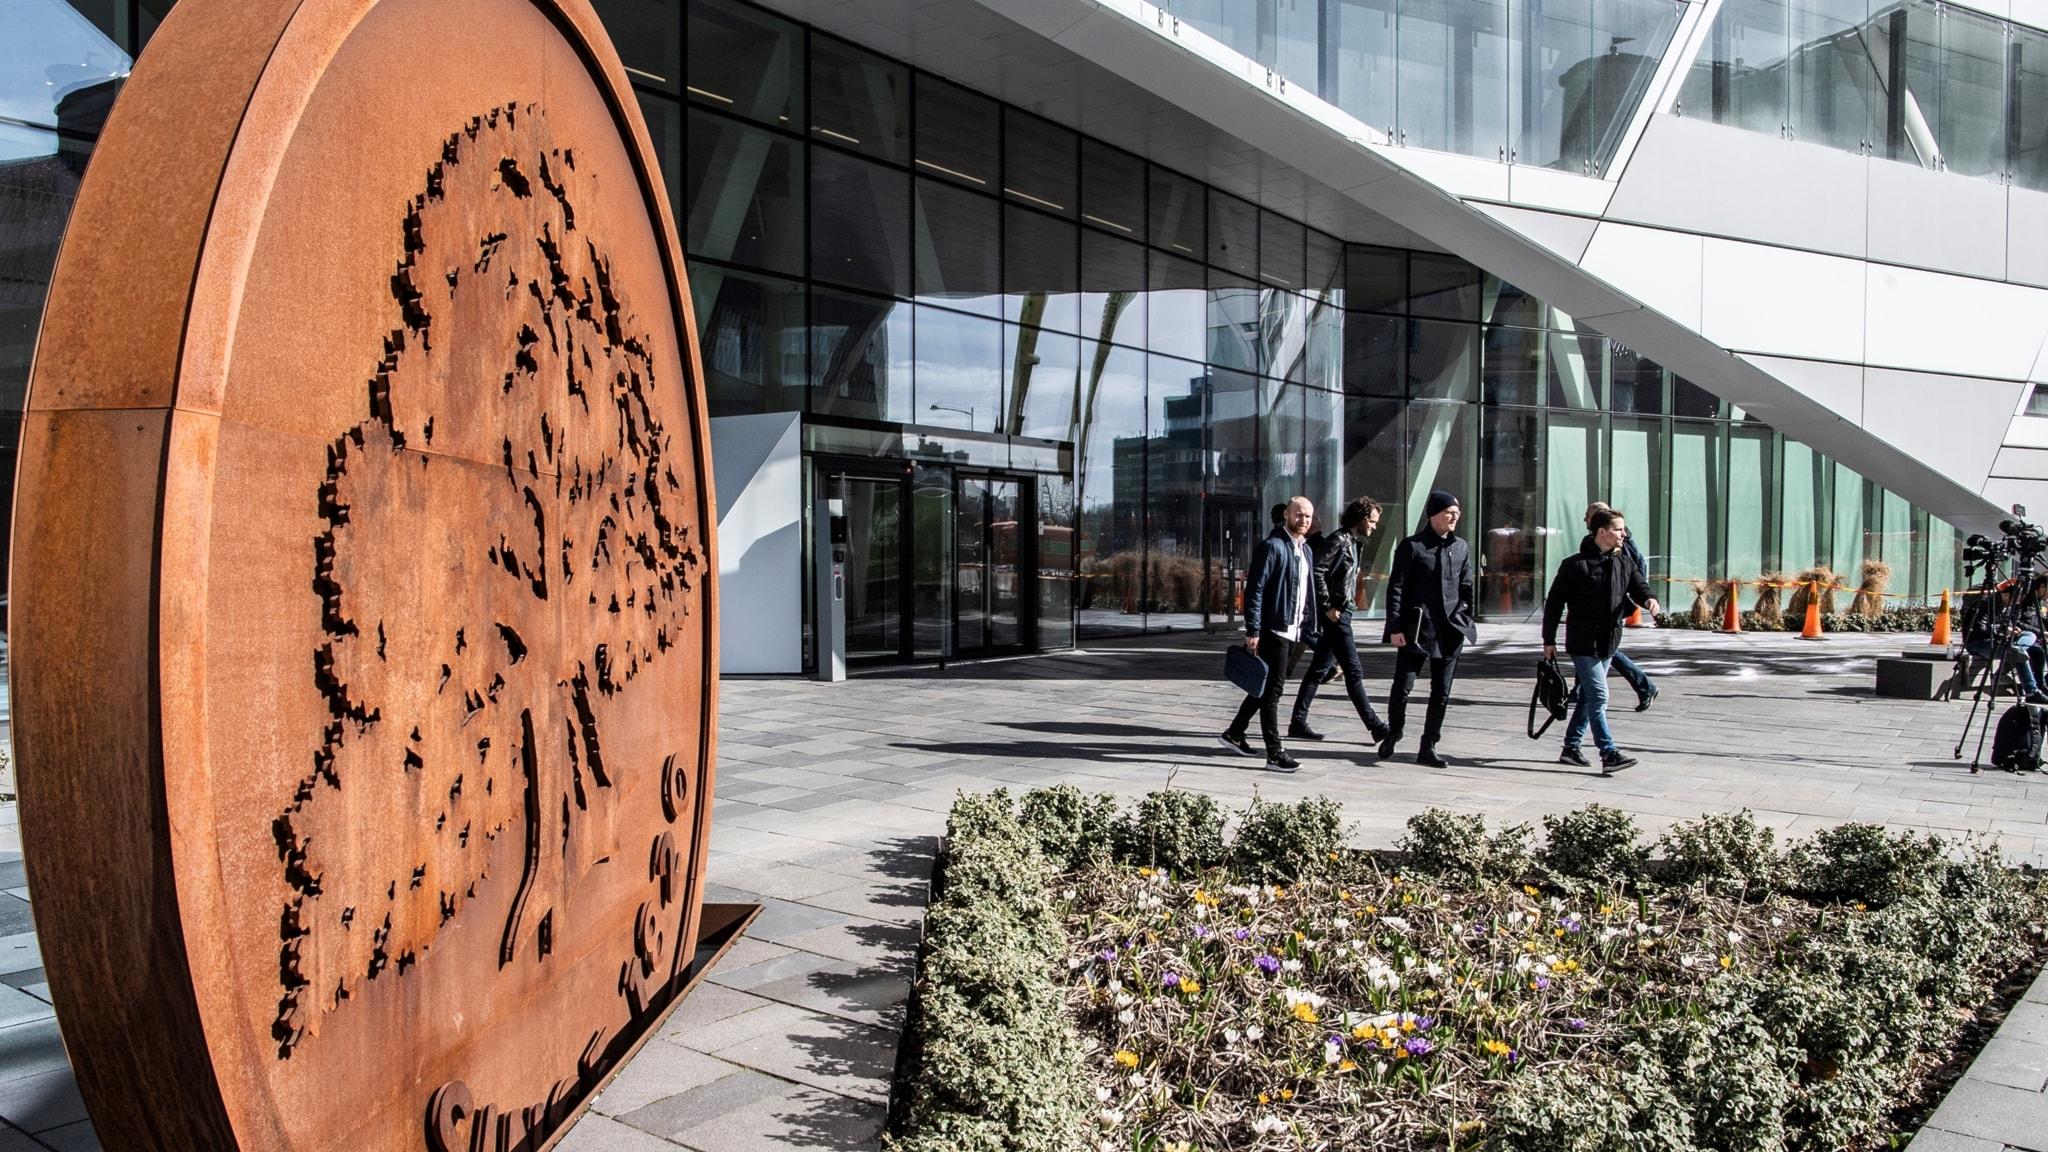 53f6d1071a6c Swedbank headquarters raided by Swedish authorities - Radio Sweden |  Sveriges Radio